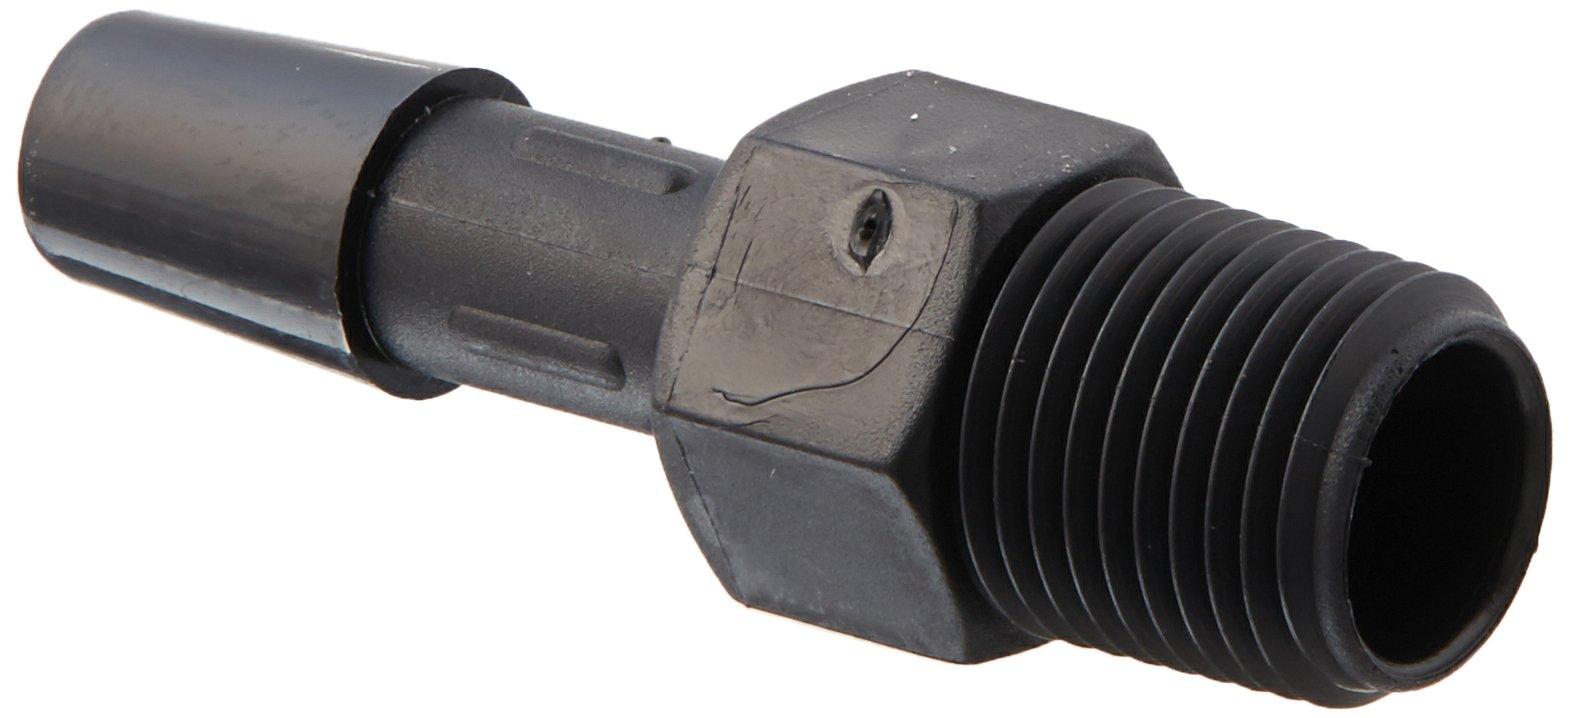 Eldon James A2-4BN Black Nylon Adapter Fitting, 1/8-27 NPT to 1/4'' Hose Barb (Pack of 10)